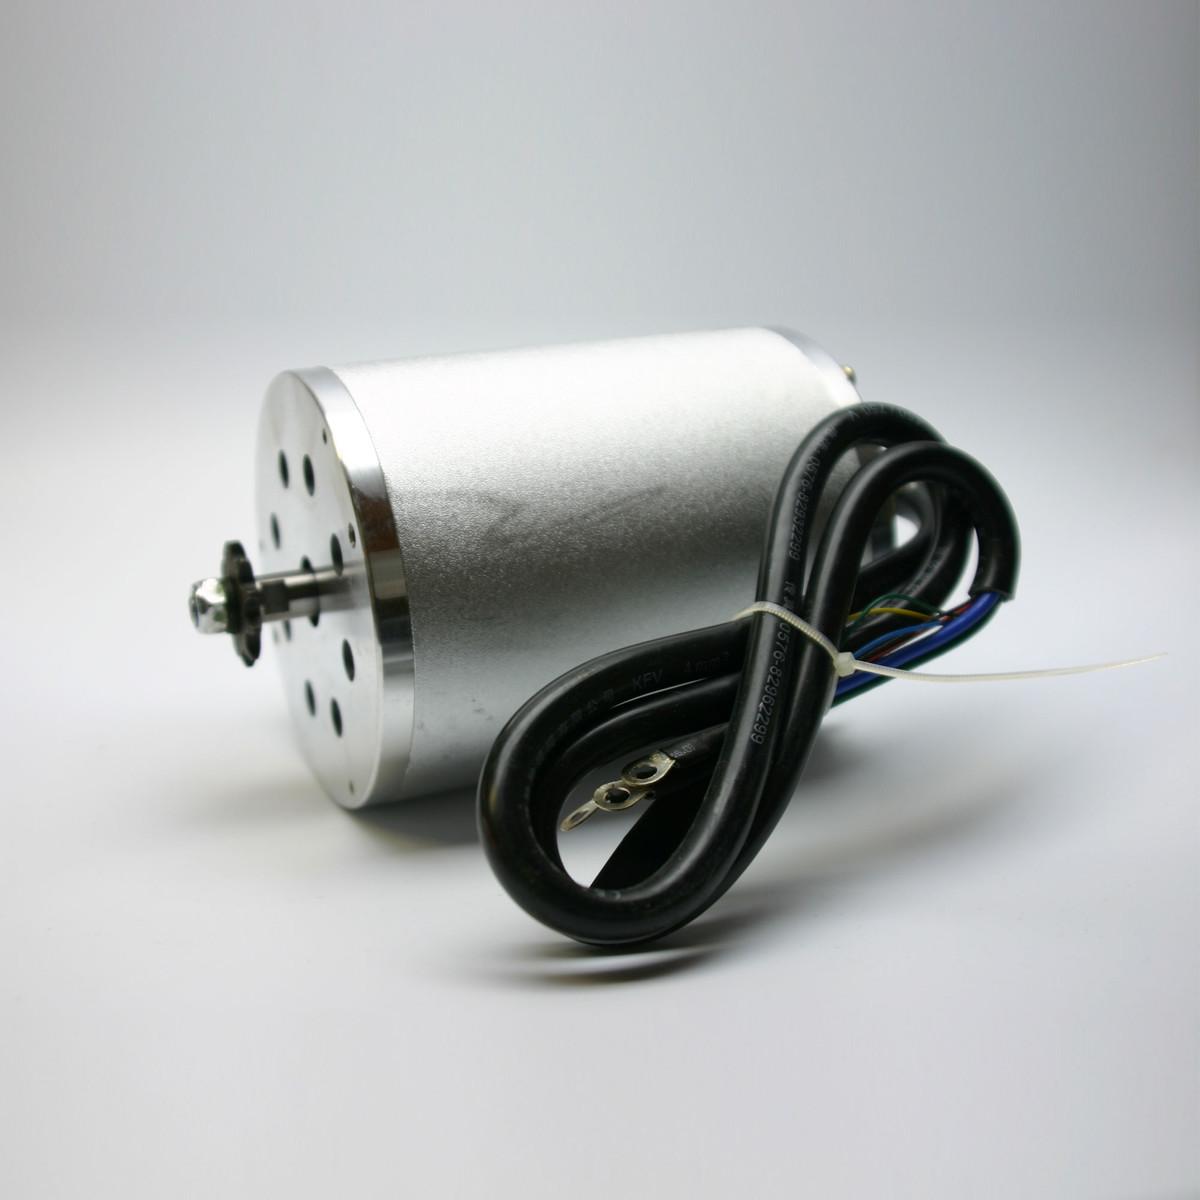 FORÇA EagleTec 1500W 48V Motor für Evoking & Bossman-S